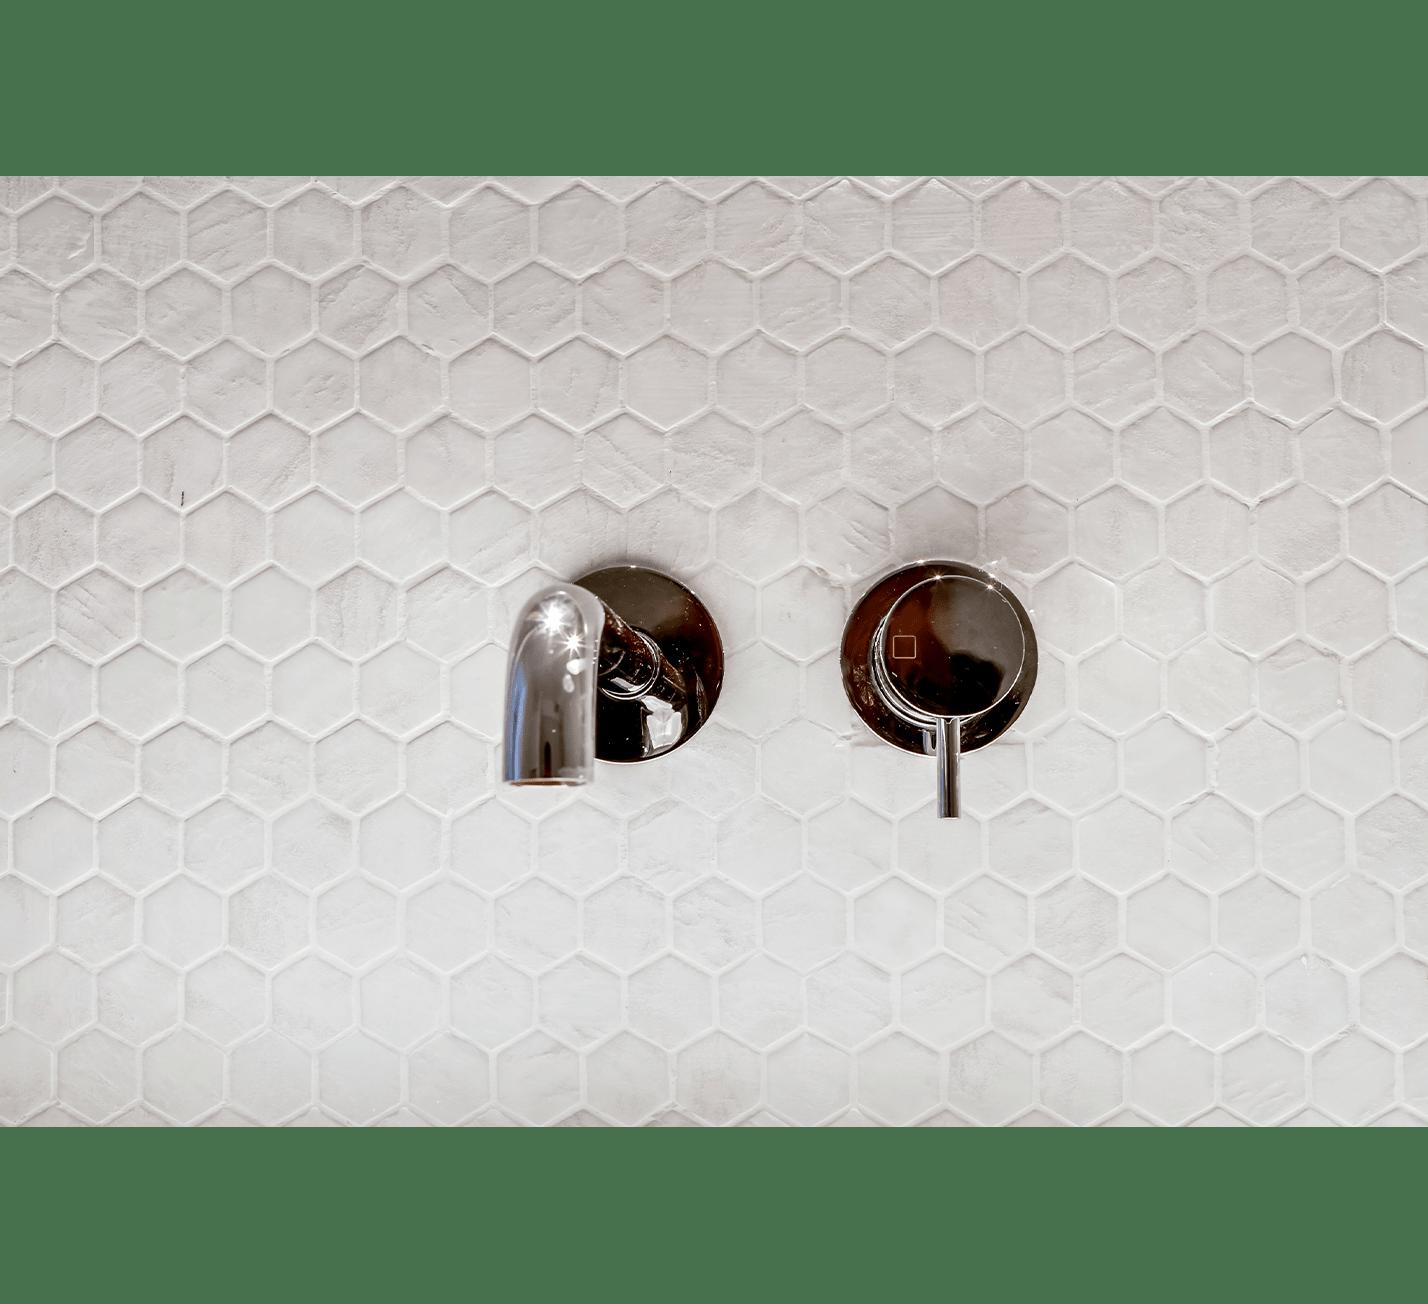 Projet-Victor-Hugo-Atelier-Steve-Pauline-Borgia-Architecture-interieur-01-min